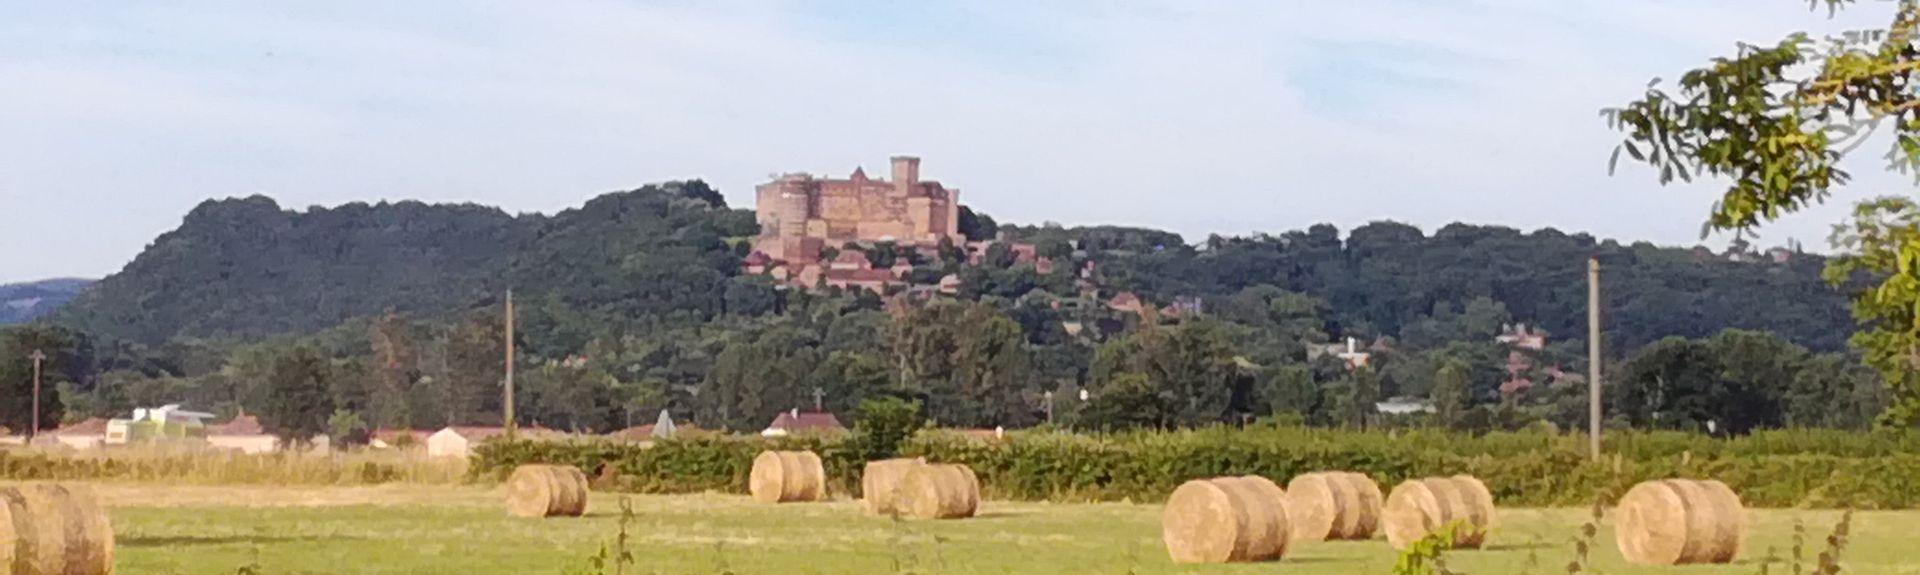 Sonac, France